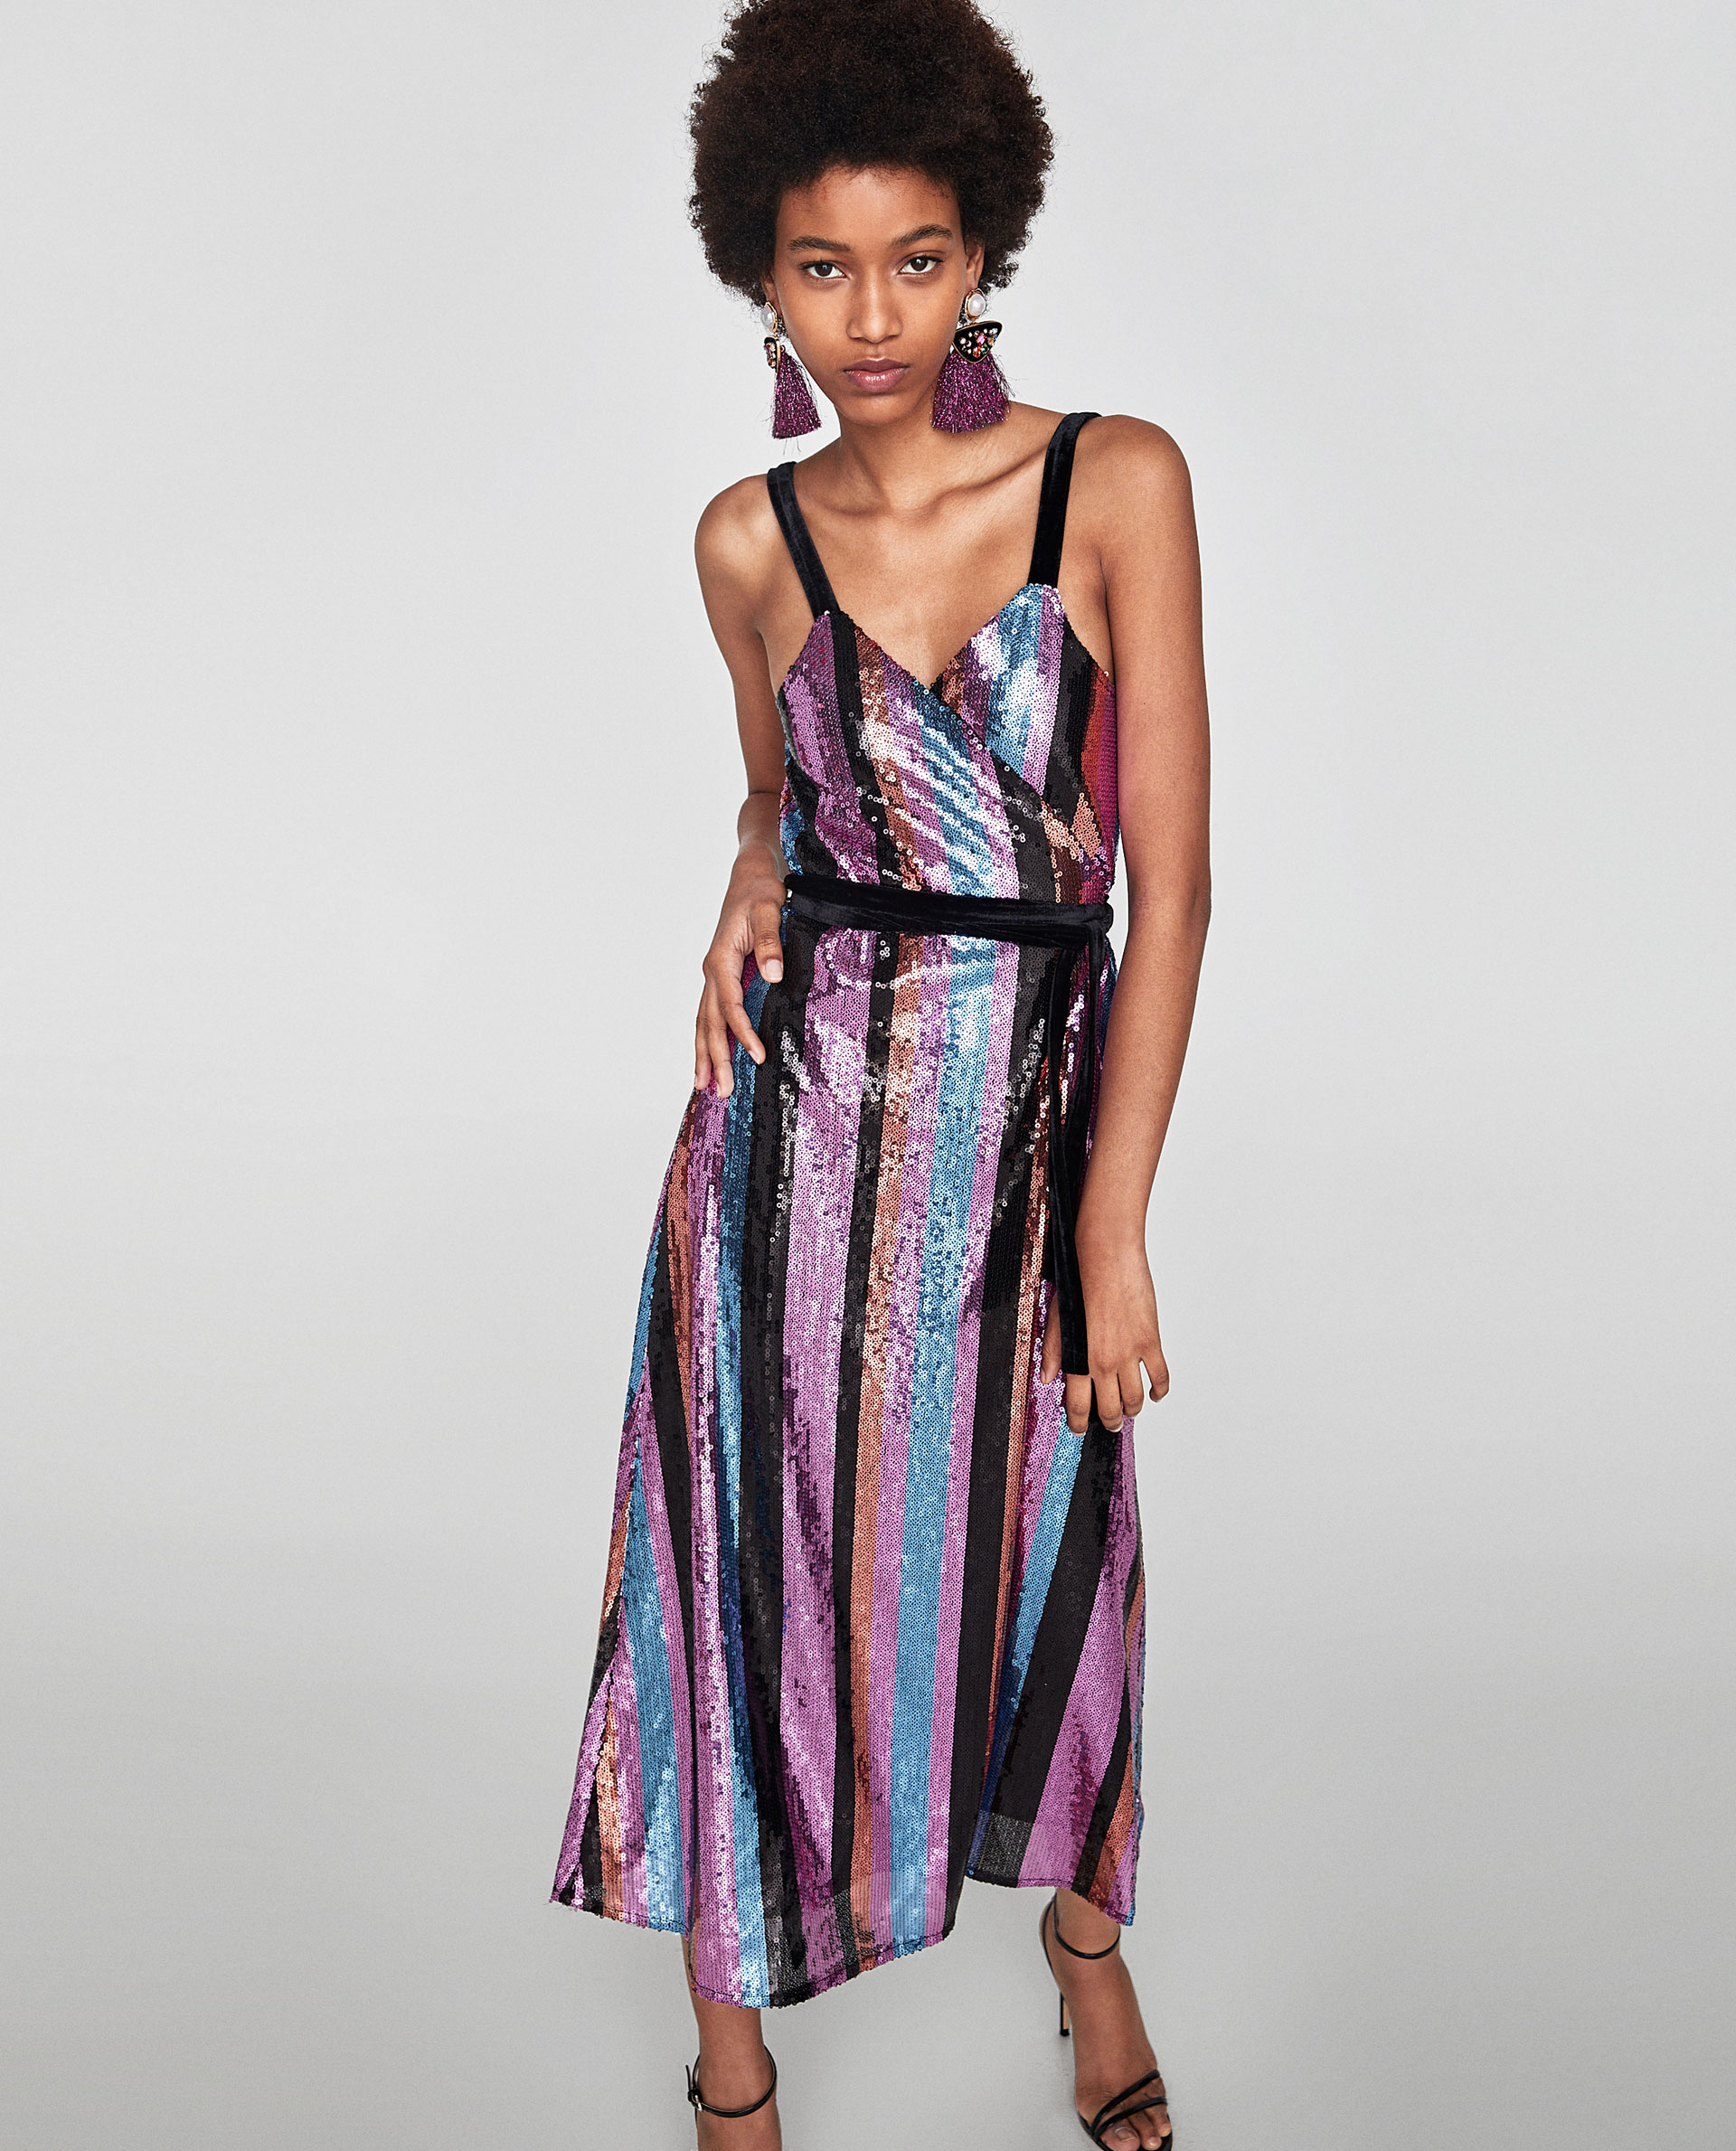 Zara Crossover Dress - £79.99